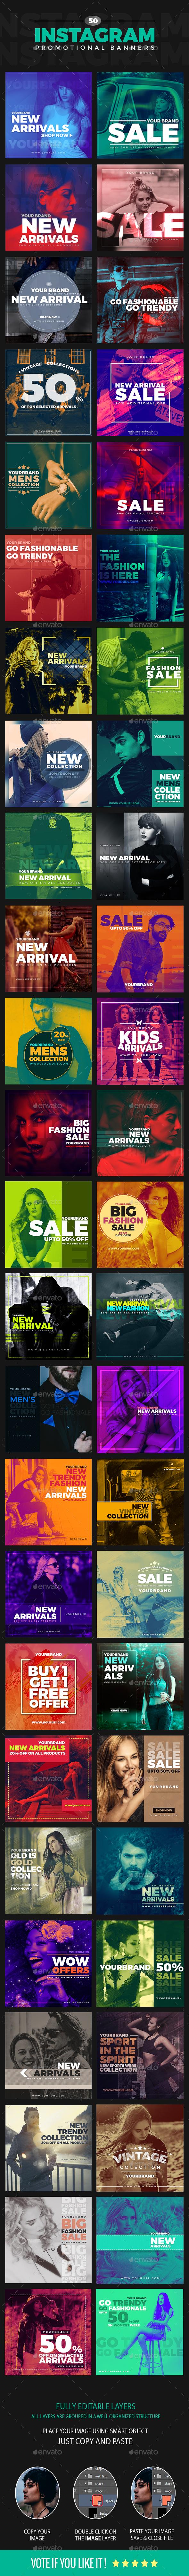 50 Duotone Instagram Banners - Social Media Web Elements